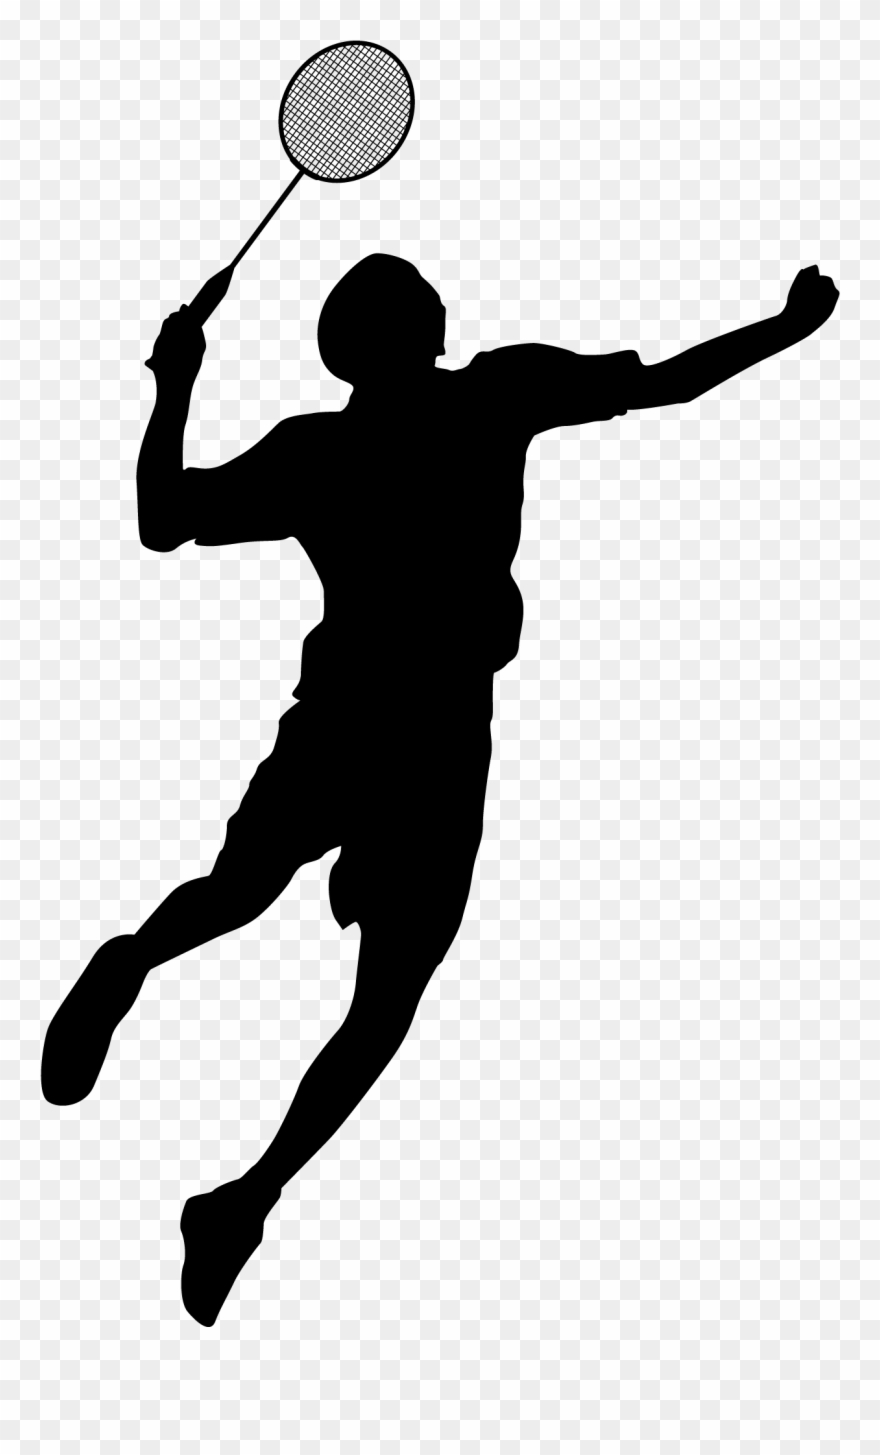 Sports Figures